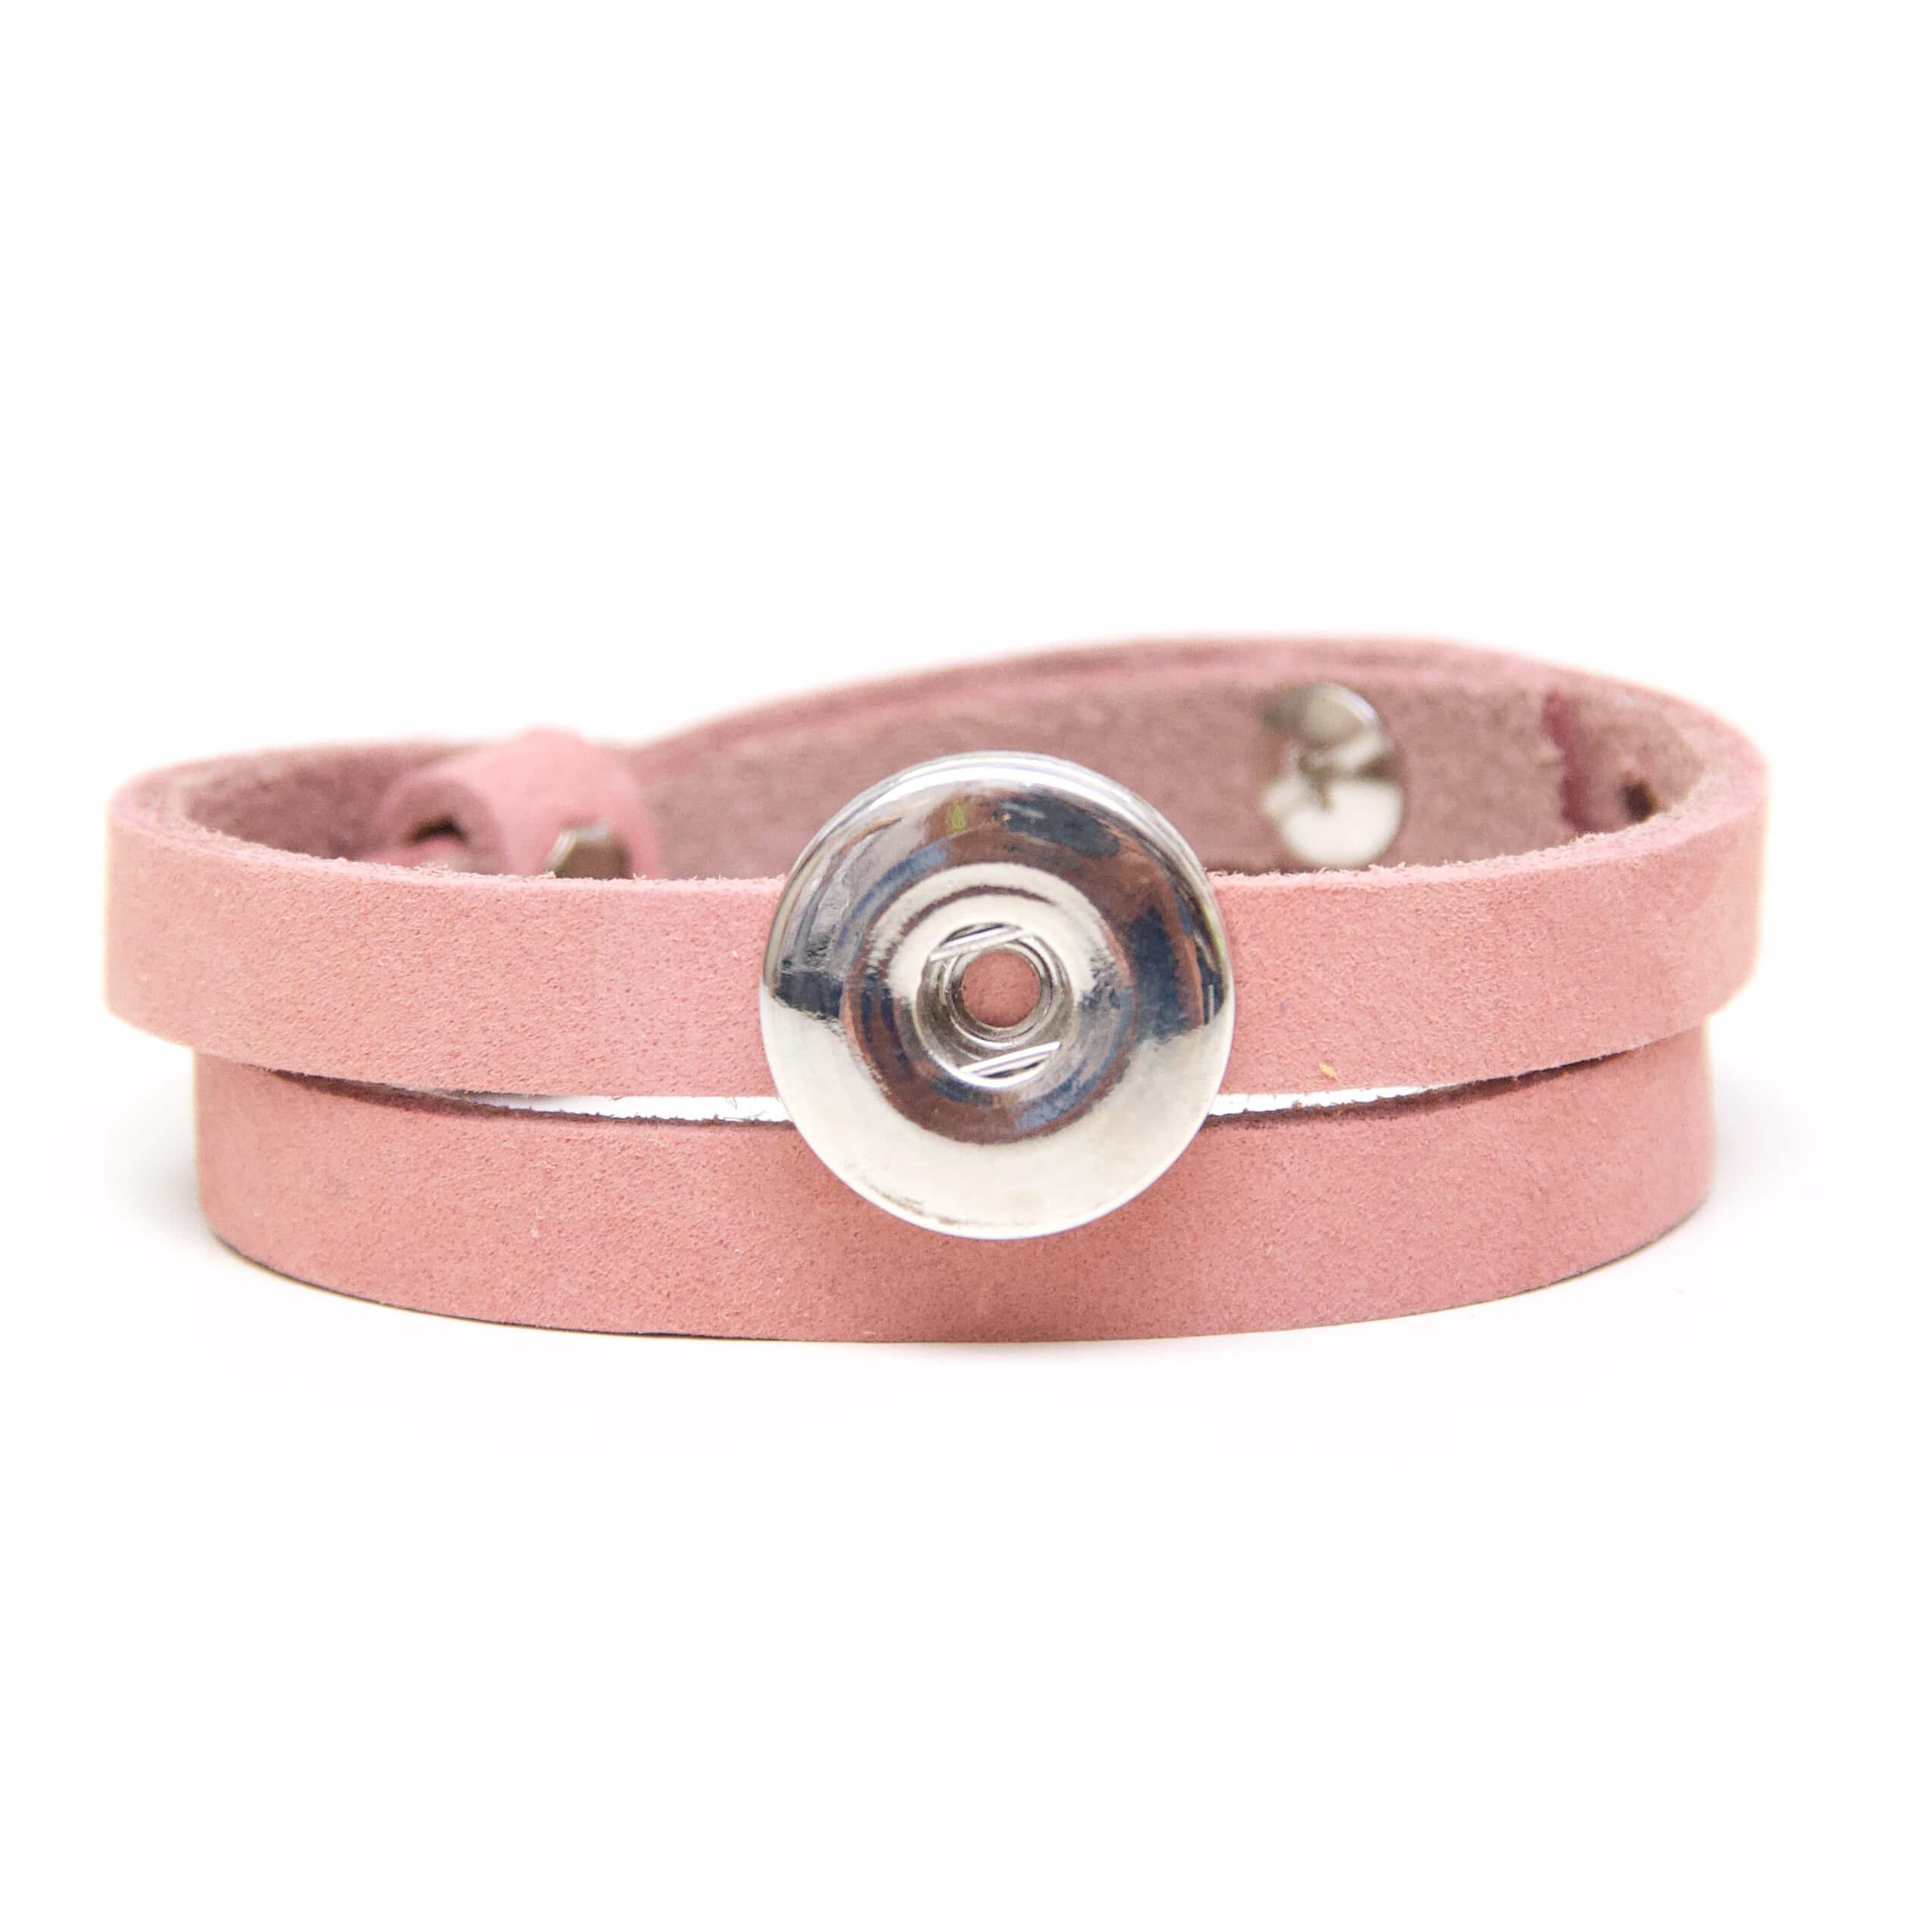 Druckknopf Lederarmband in zart rosa für 16mm Druckknöpfe